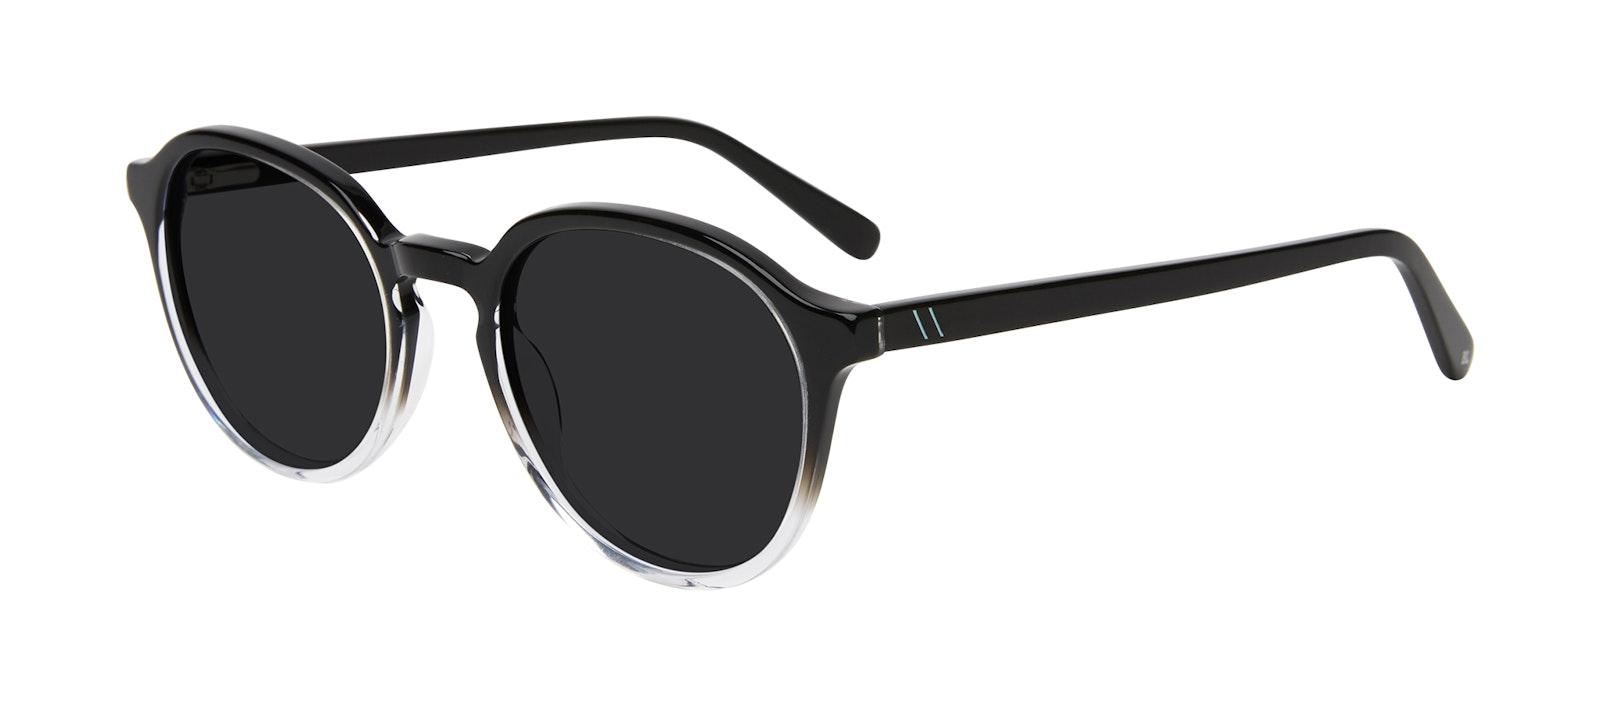 Affordable Fashion Glasses Round Sunglasses Men Ansel Onyx Clear Tilt